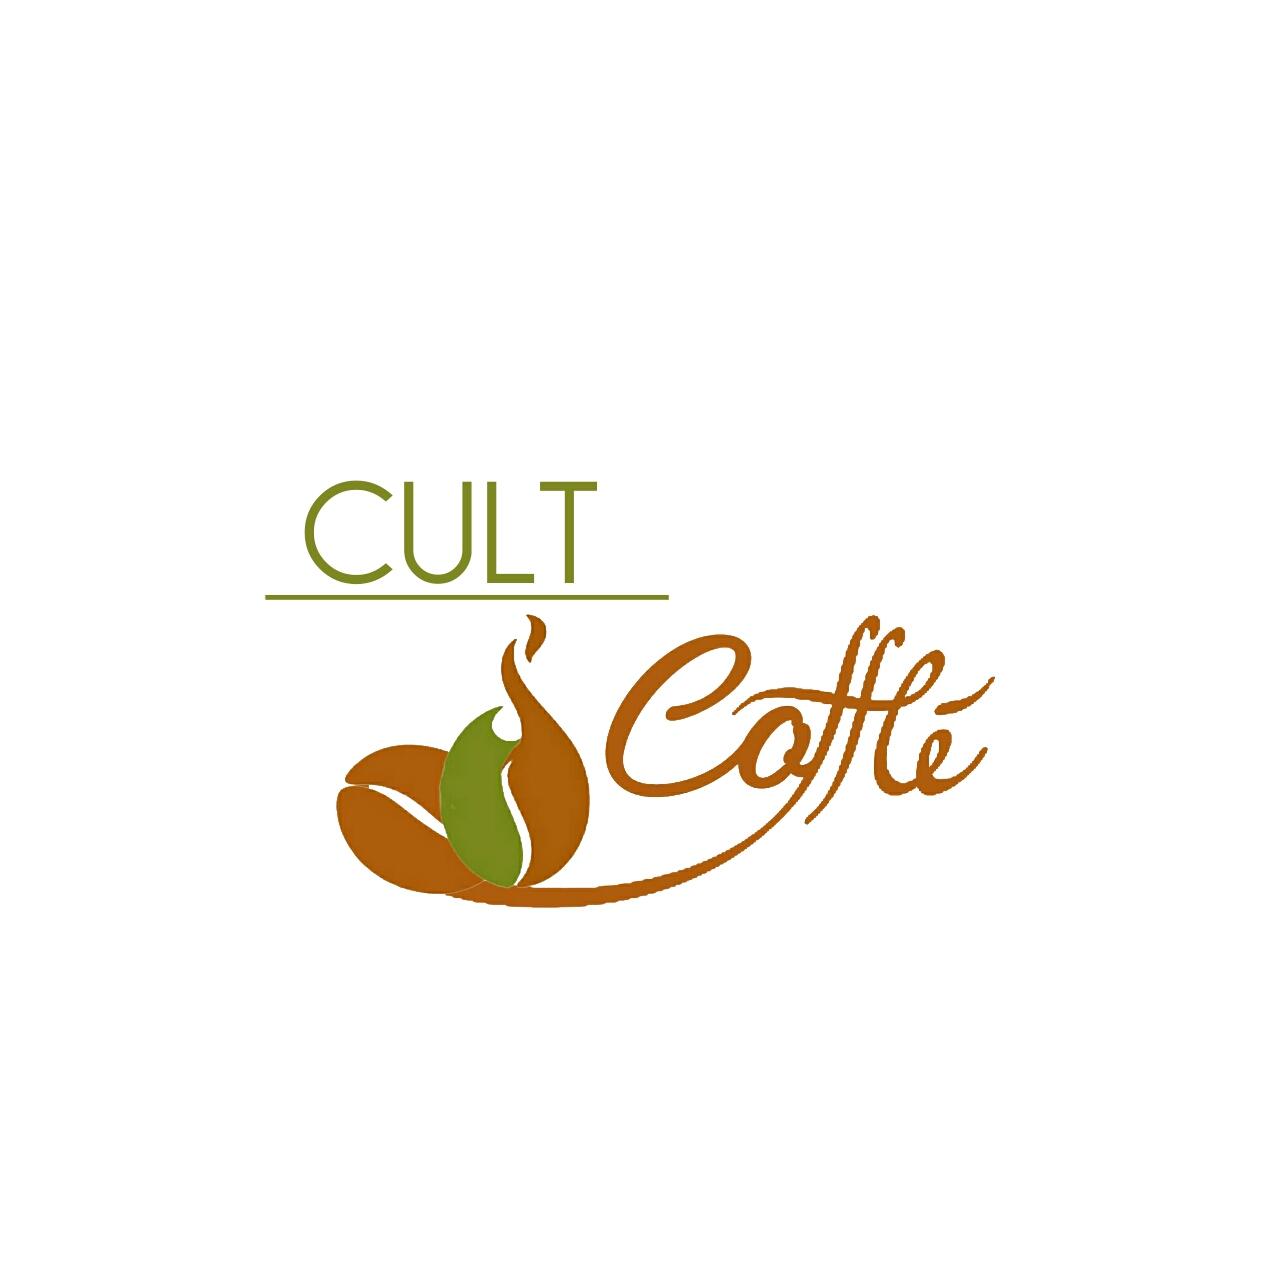 Логотип и фирменный стиль для компании COFFEE CULT фото f_6815bc209e18a388.jpg